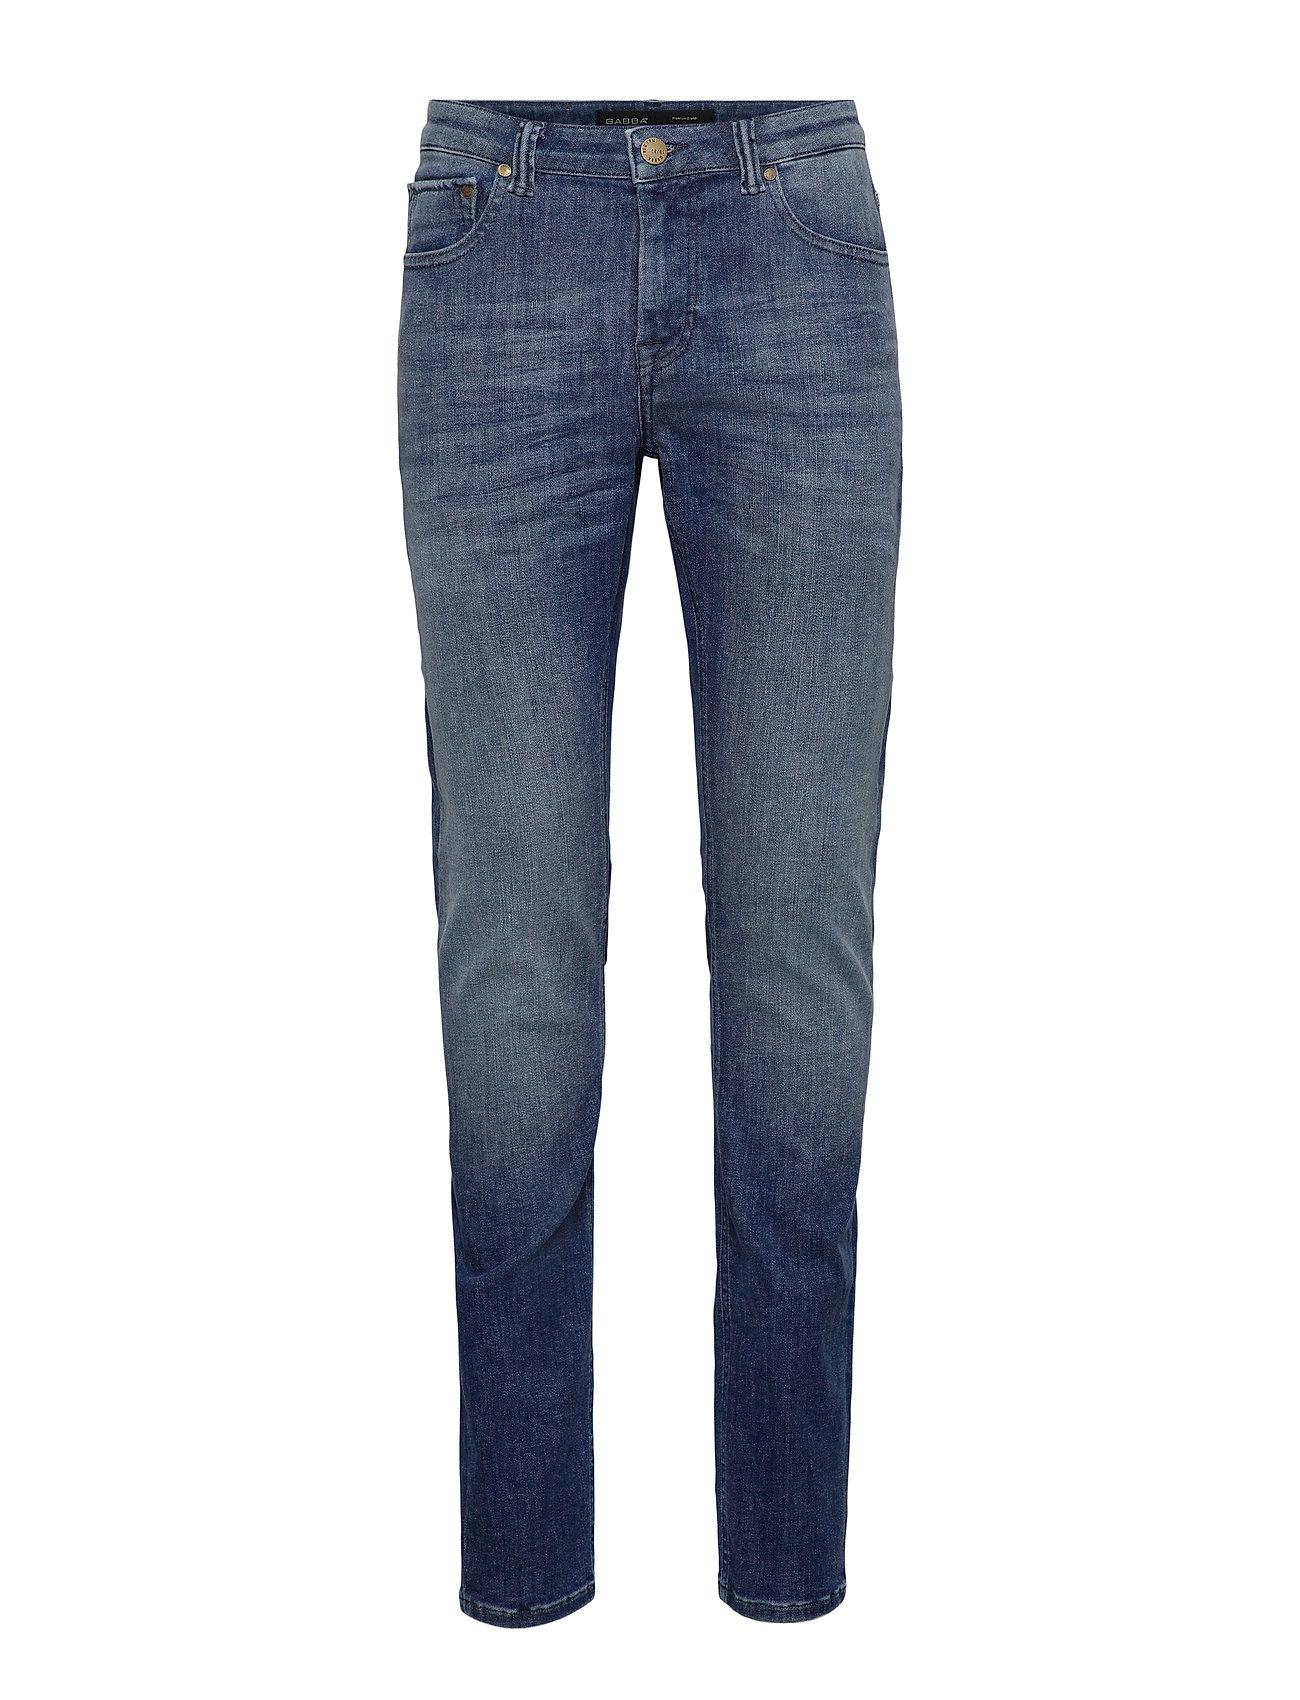 Image of J S K3412 Jeans Slim Jeans Blå Gabba (3484278351)